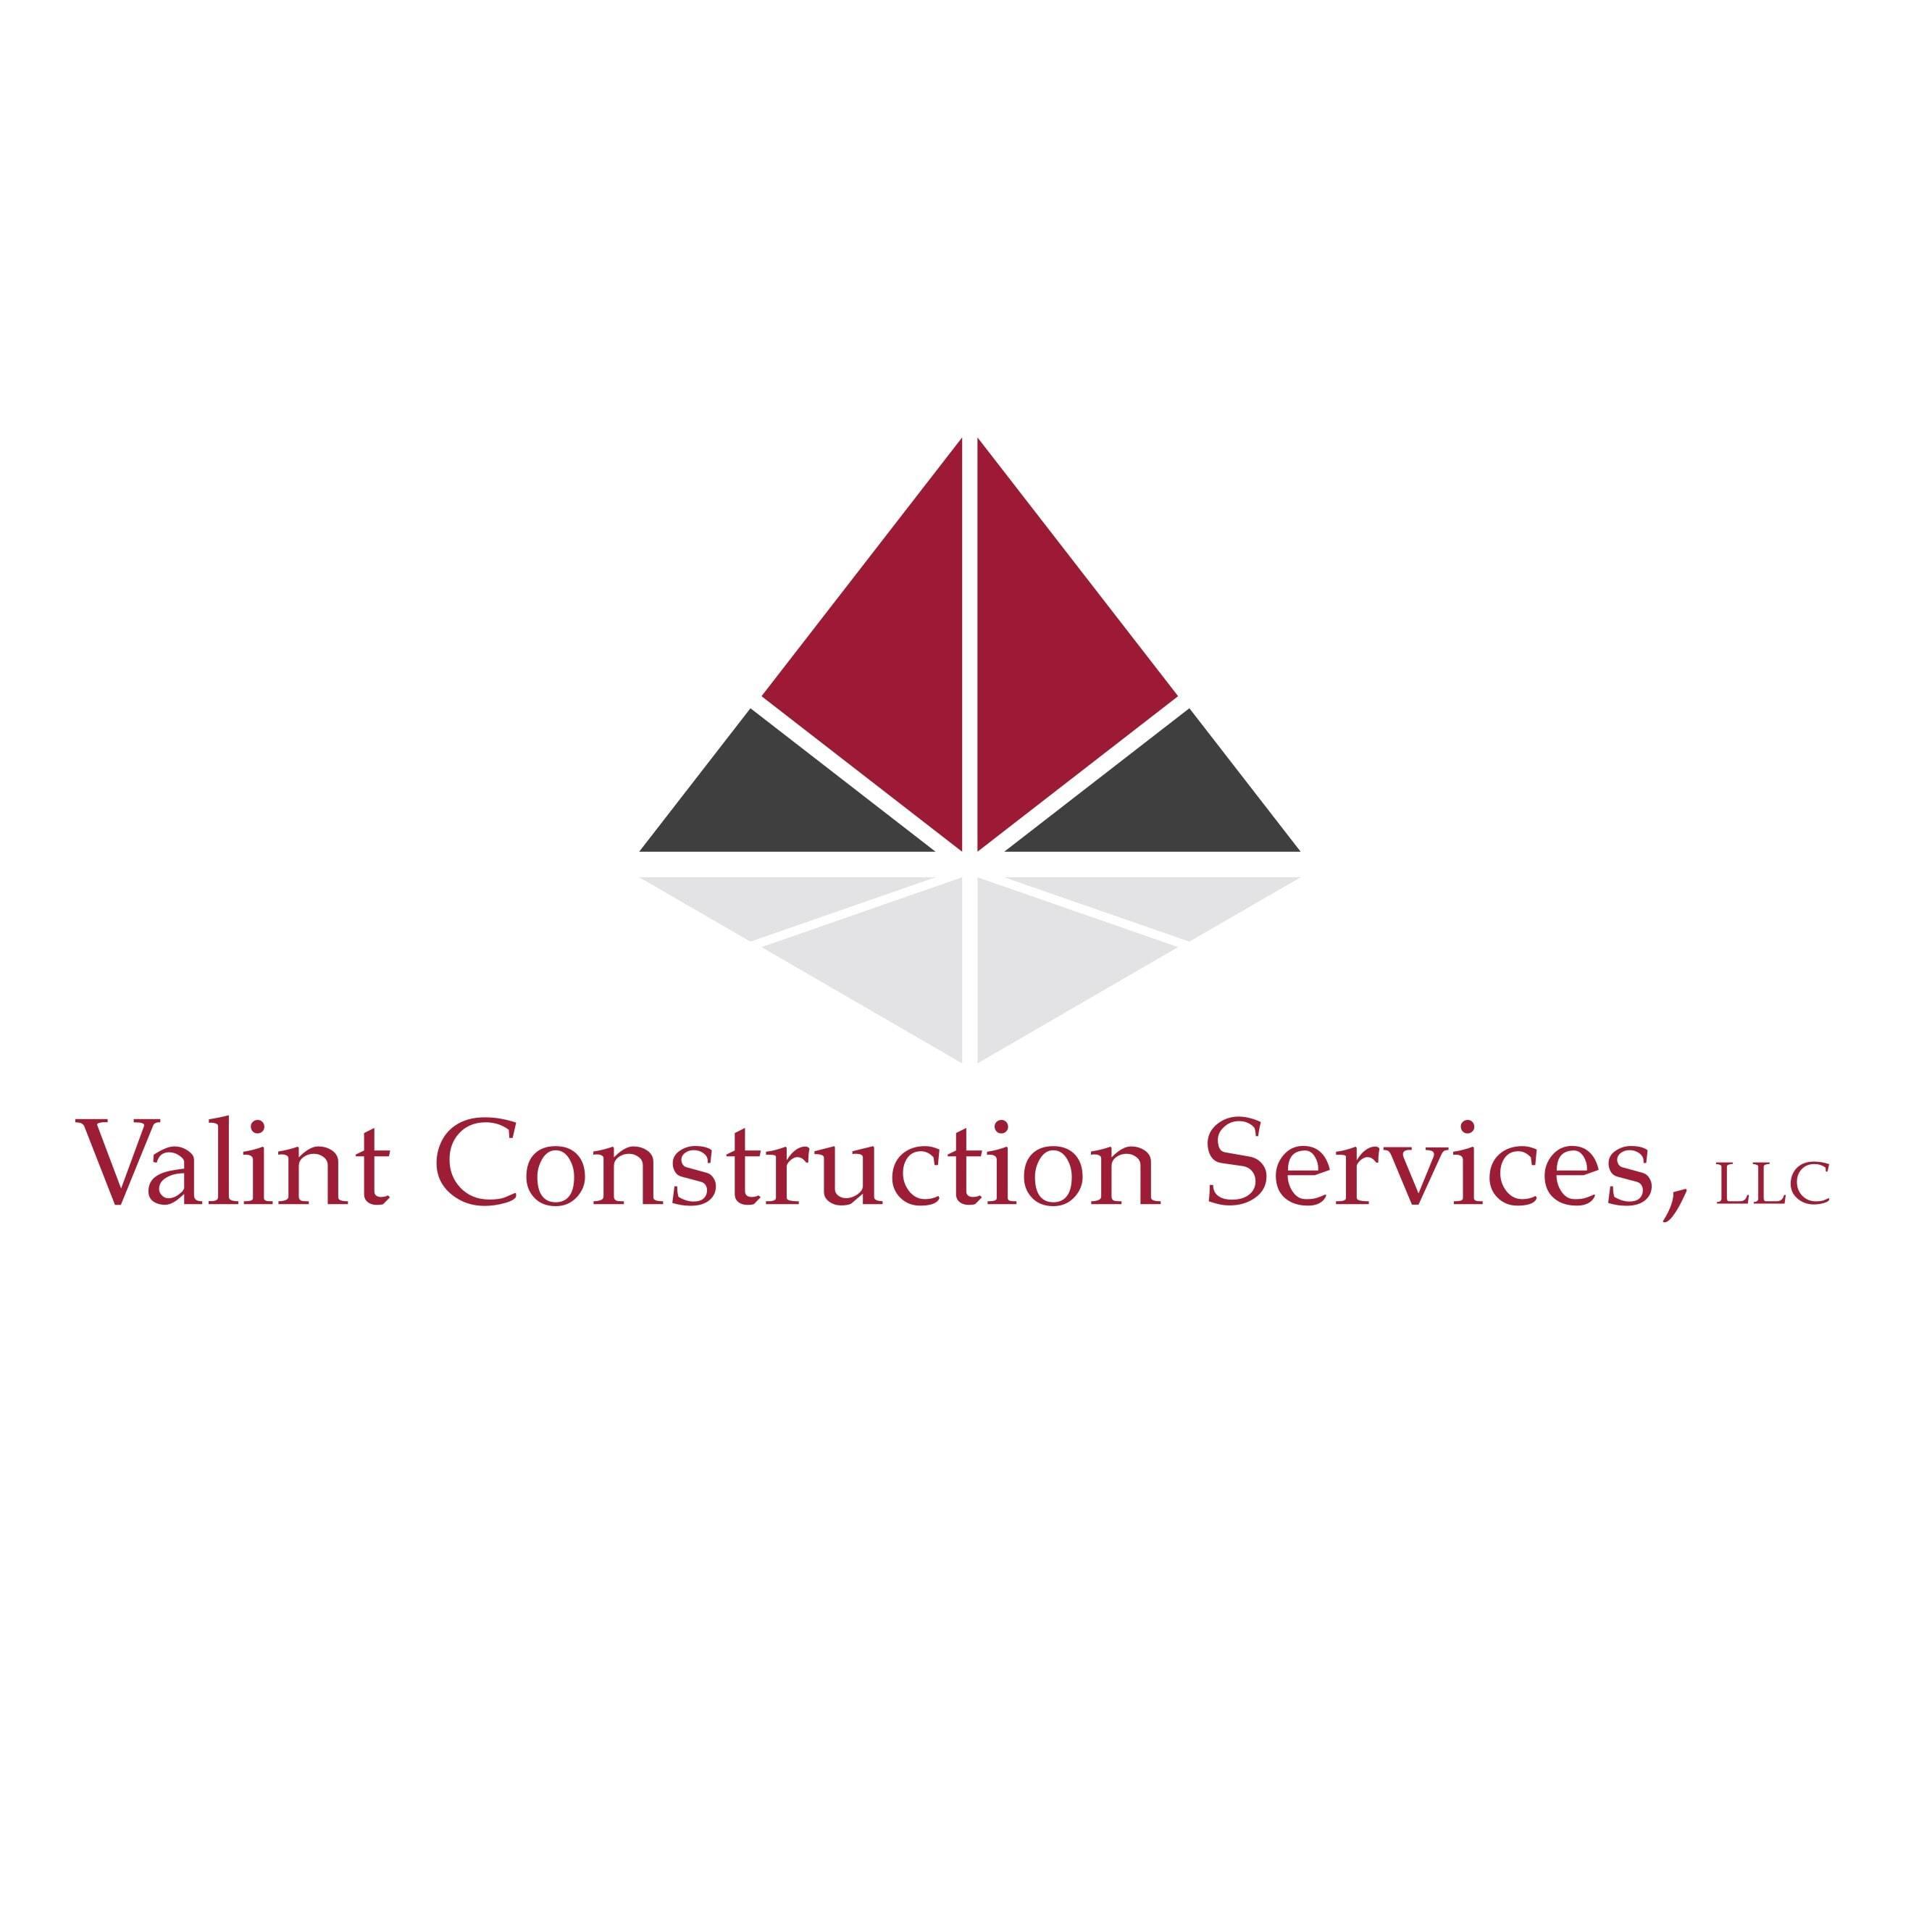 Valint Construction Services, LLC